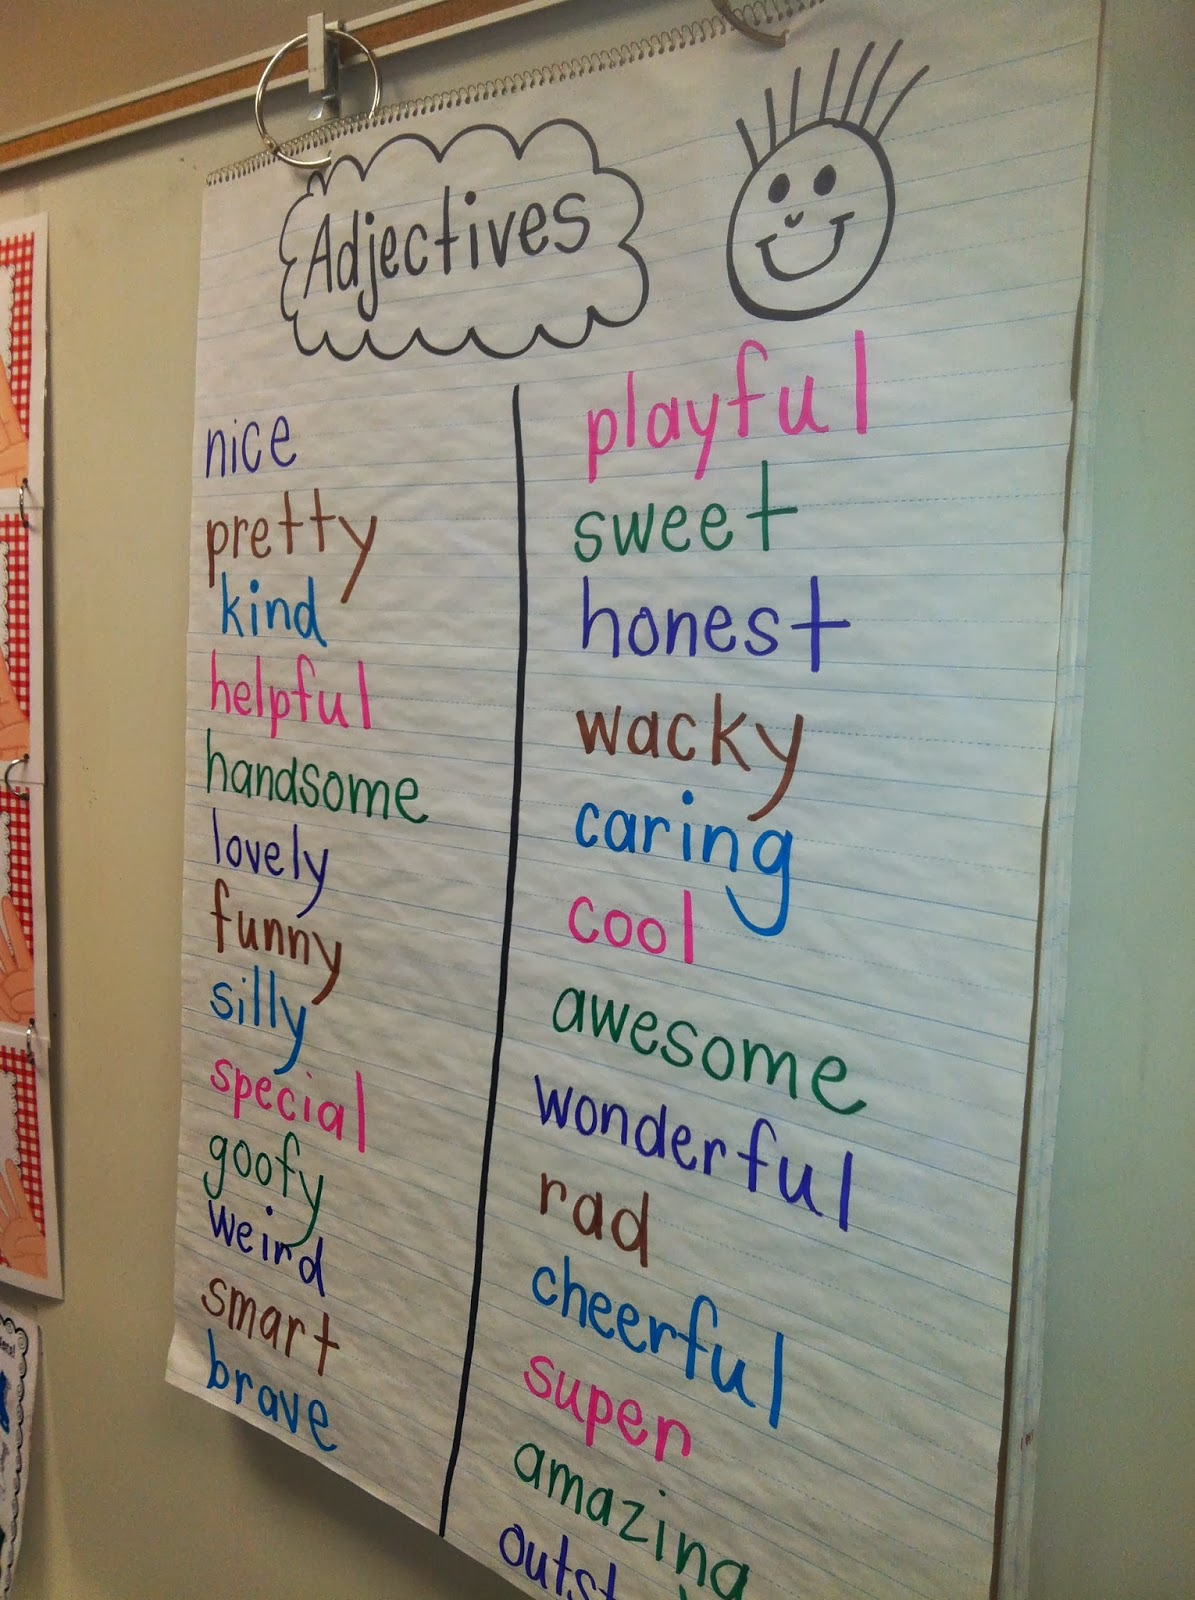 Worksheet Adjectives For First Grade mrs wheelers first grade tidbits adjectives